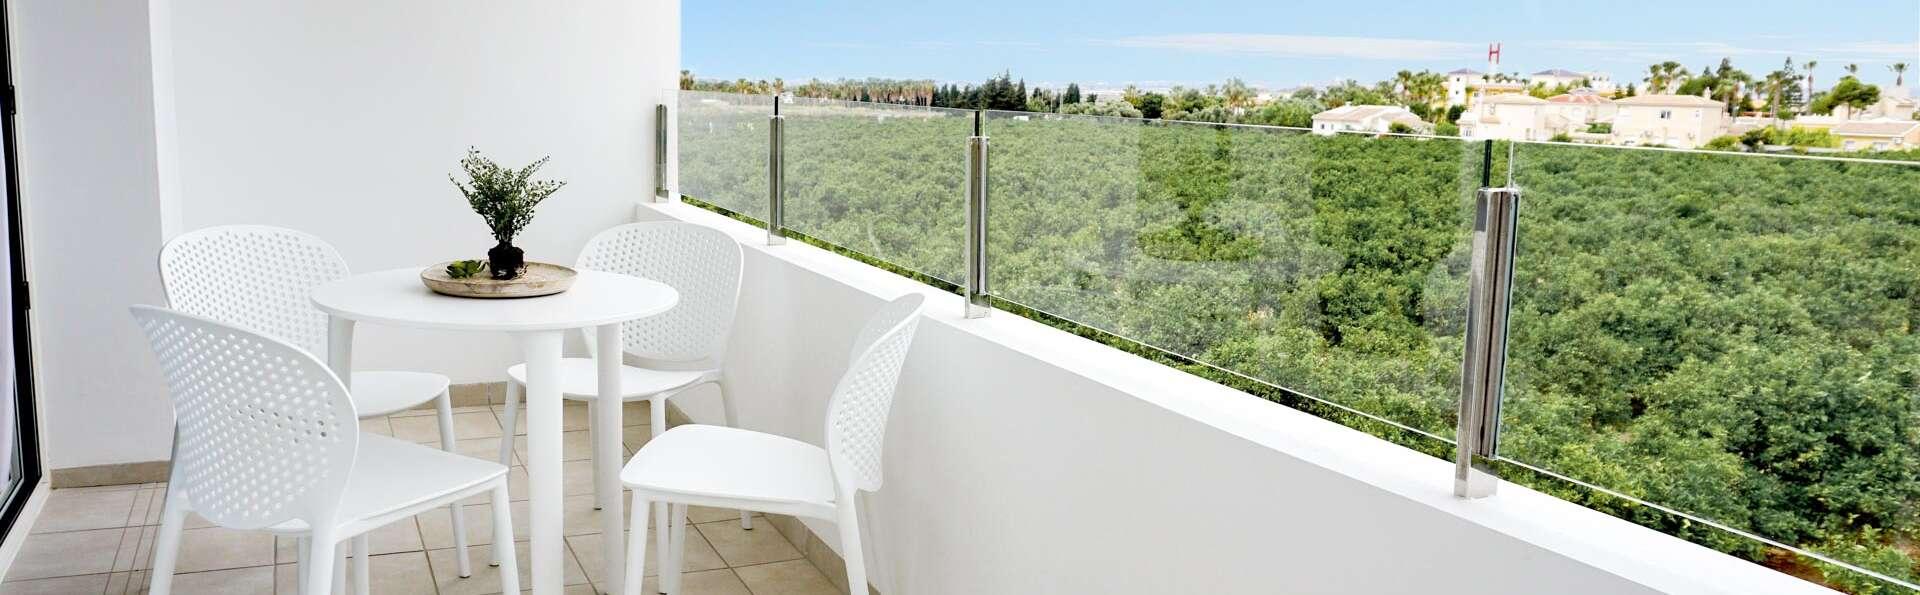 Hotel La Laguna Spa & Golf - EDIT_N2_TERRACE_01.jpg